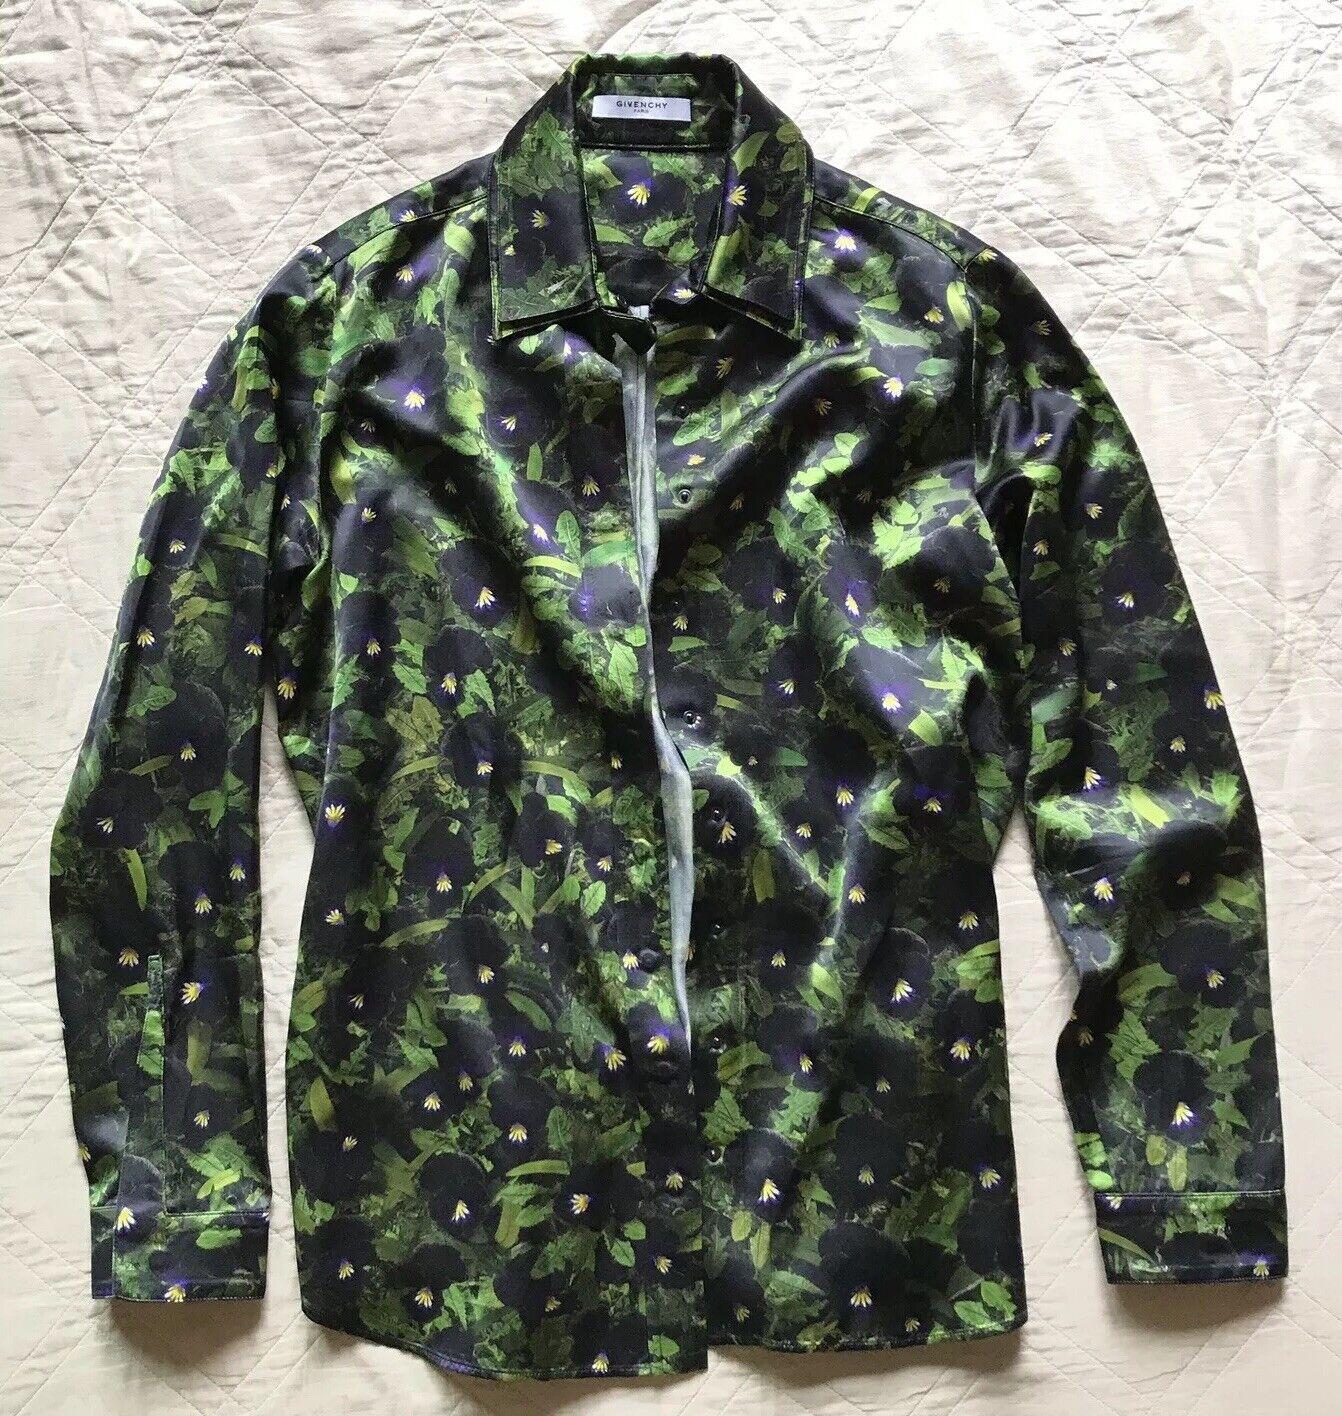 GIVENCHY⚡️Floral snap button long sleeve silky blouse shirt Größe 42 Large